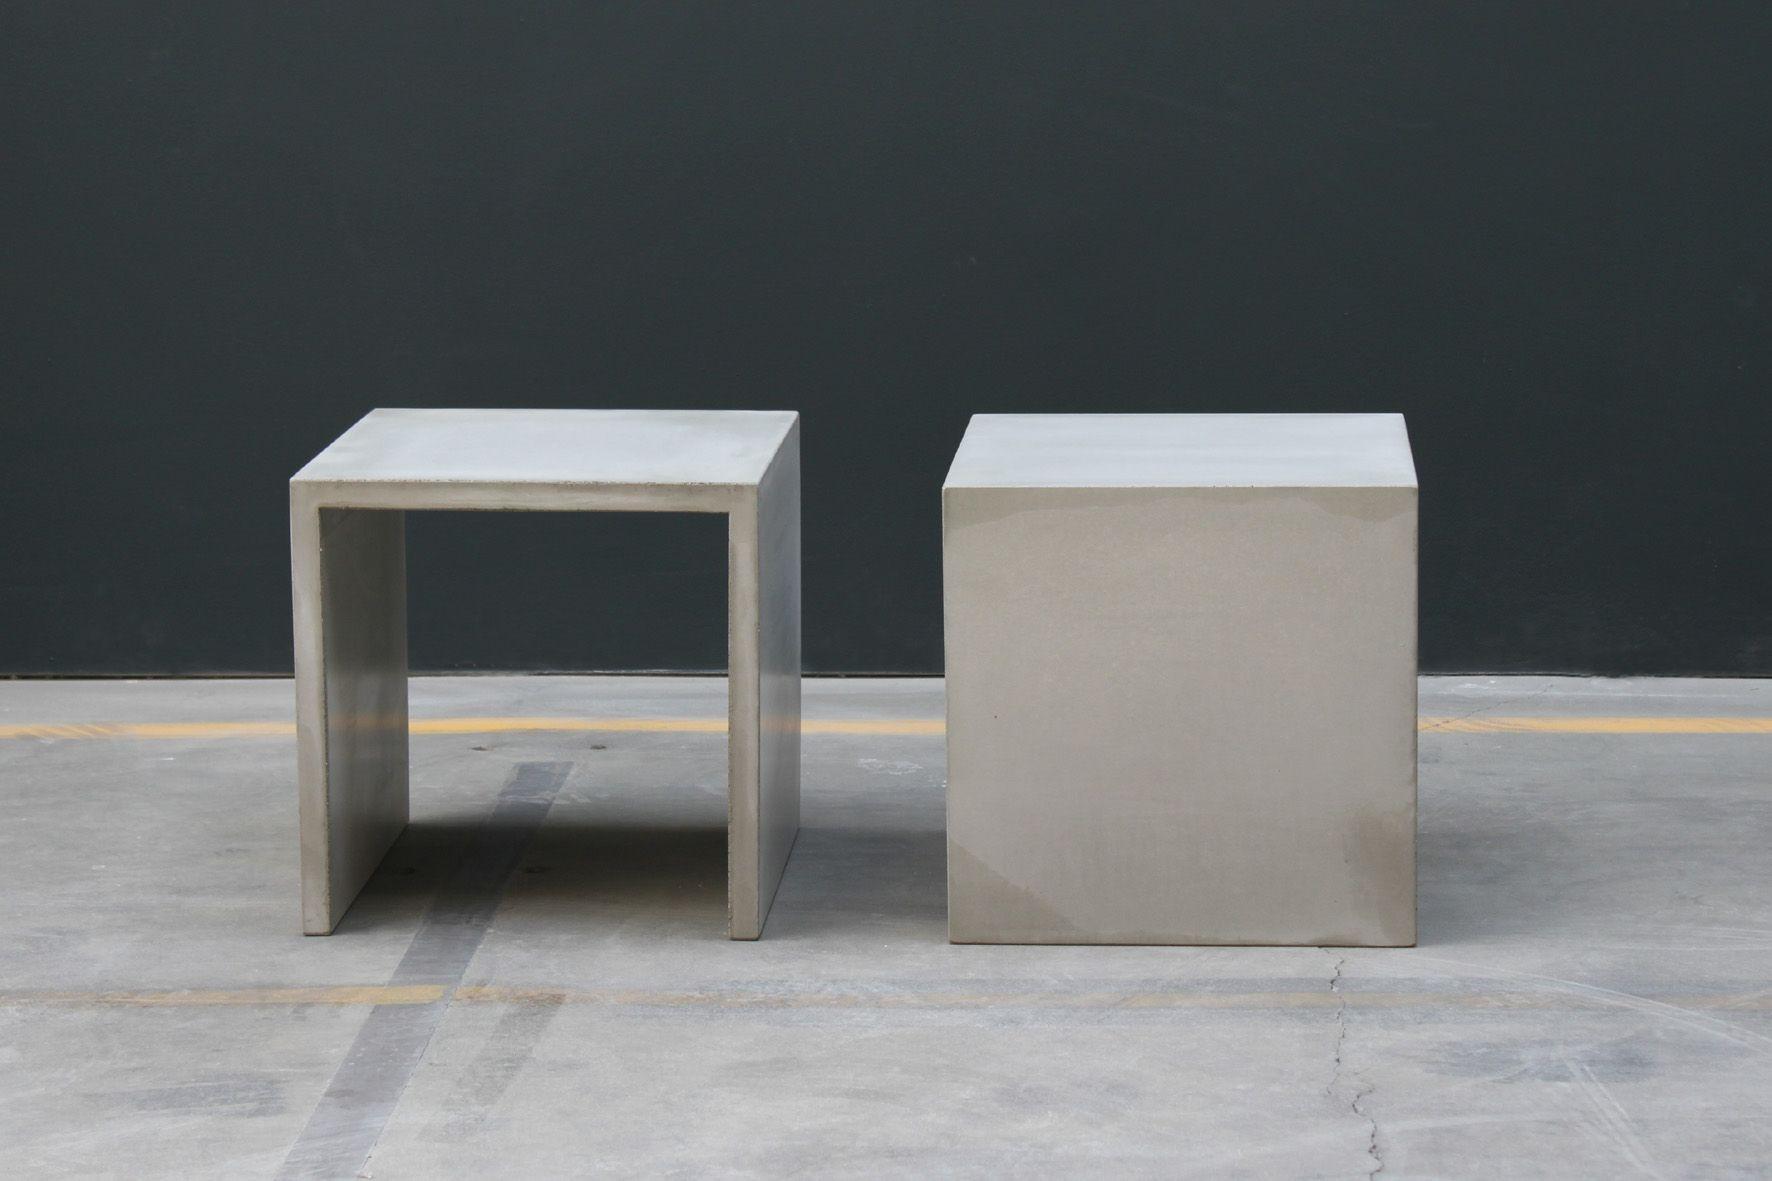 hocker beistelltisch betonoptik beton grey dekoration. Black Bedroom Furniture Sets. Home Design Ideas